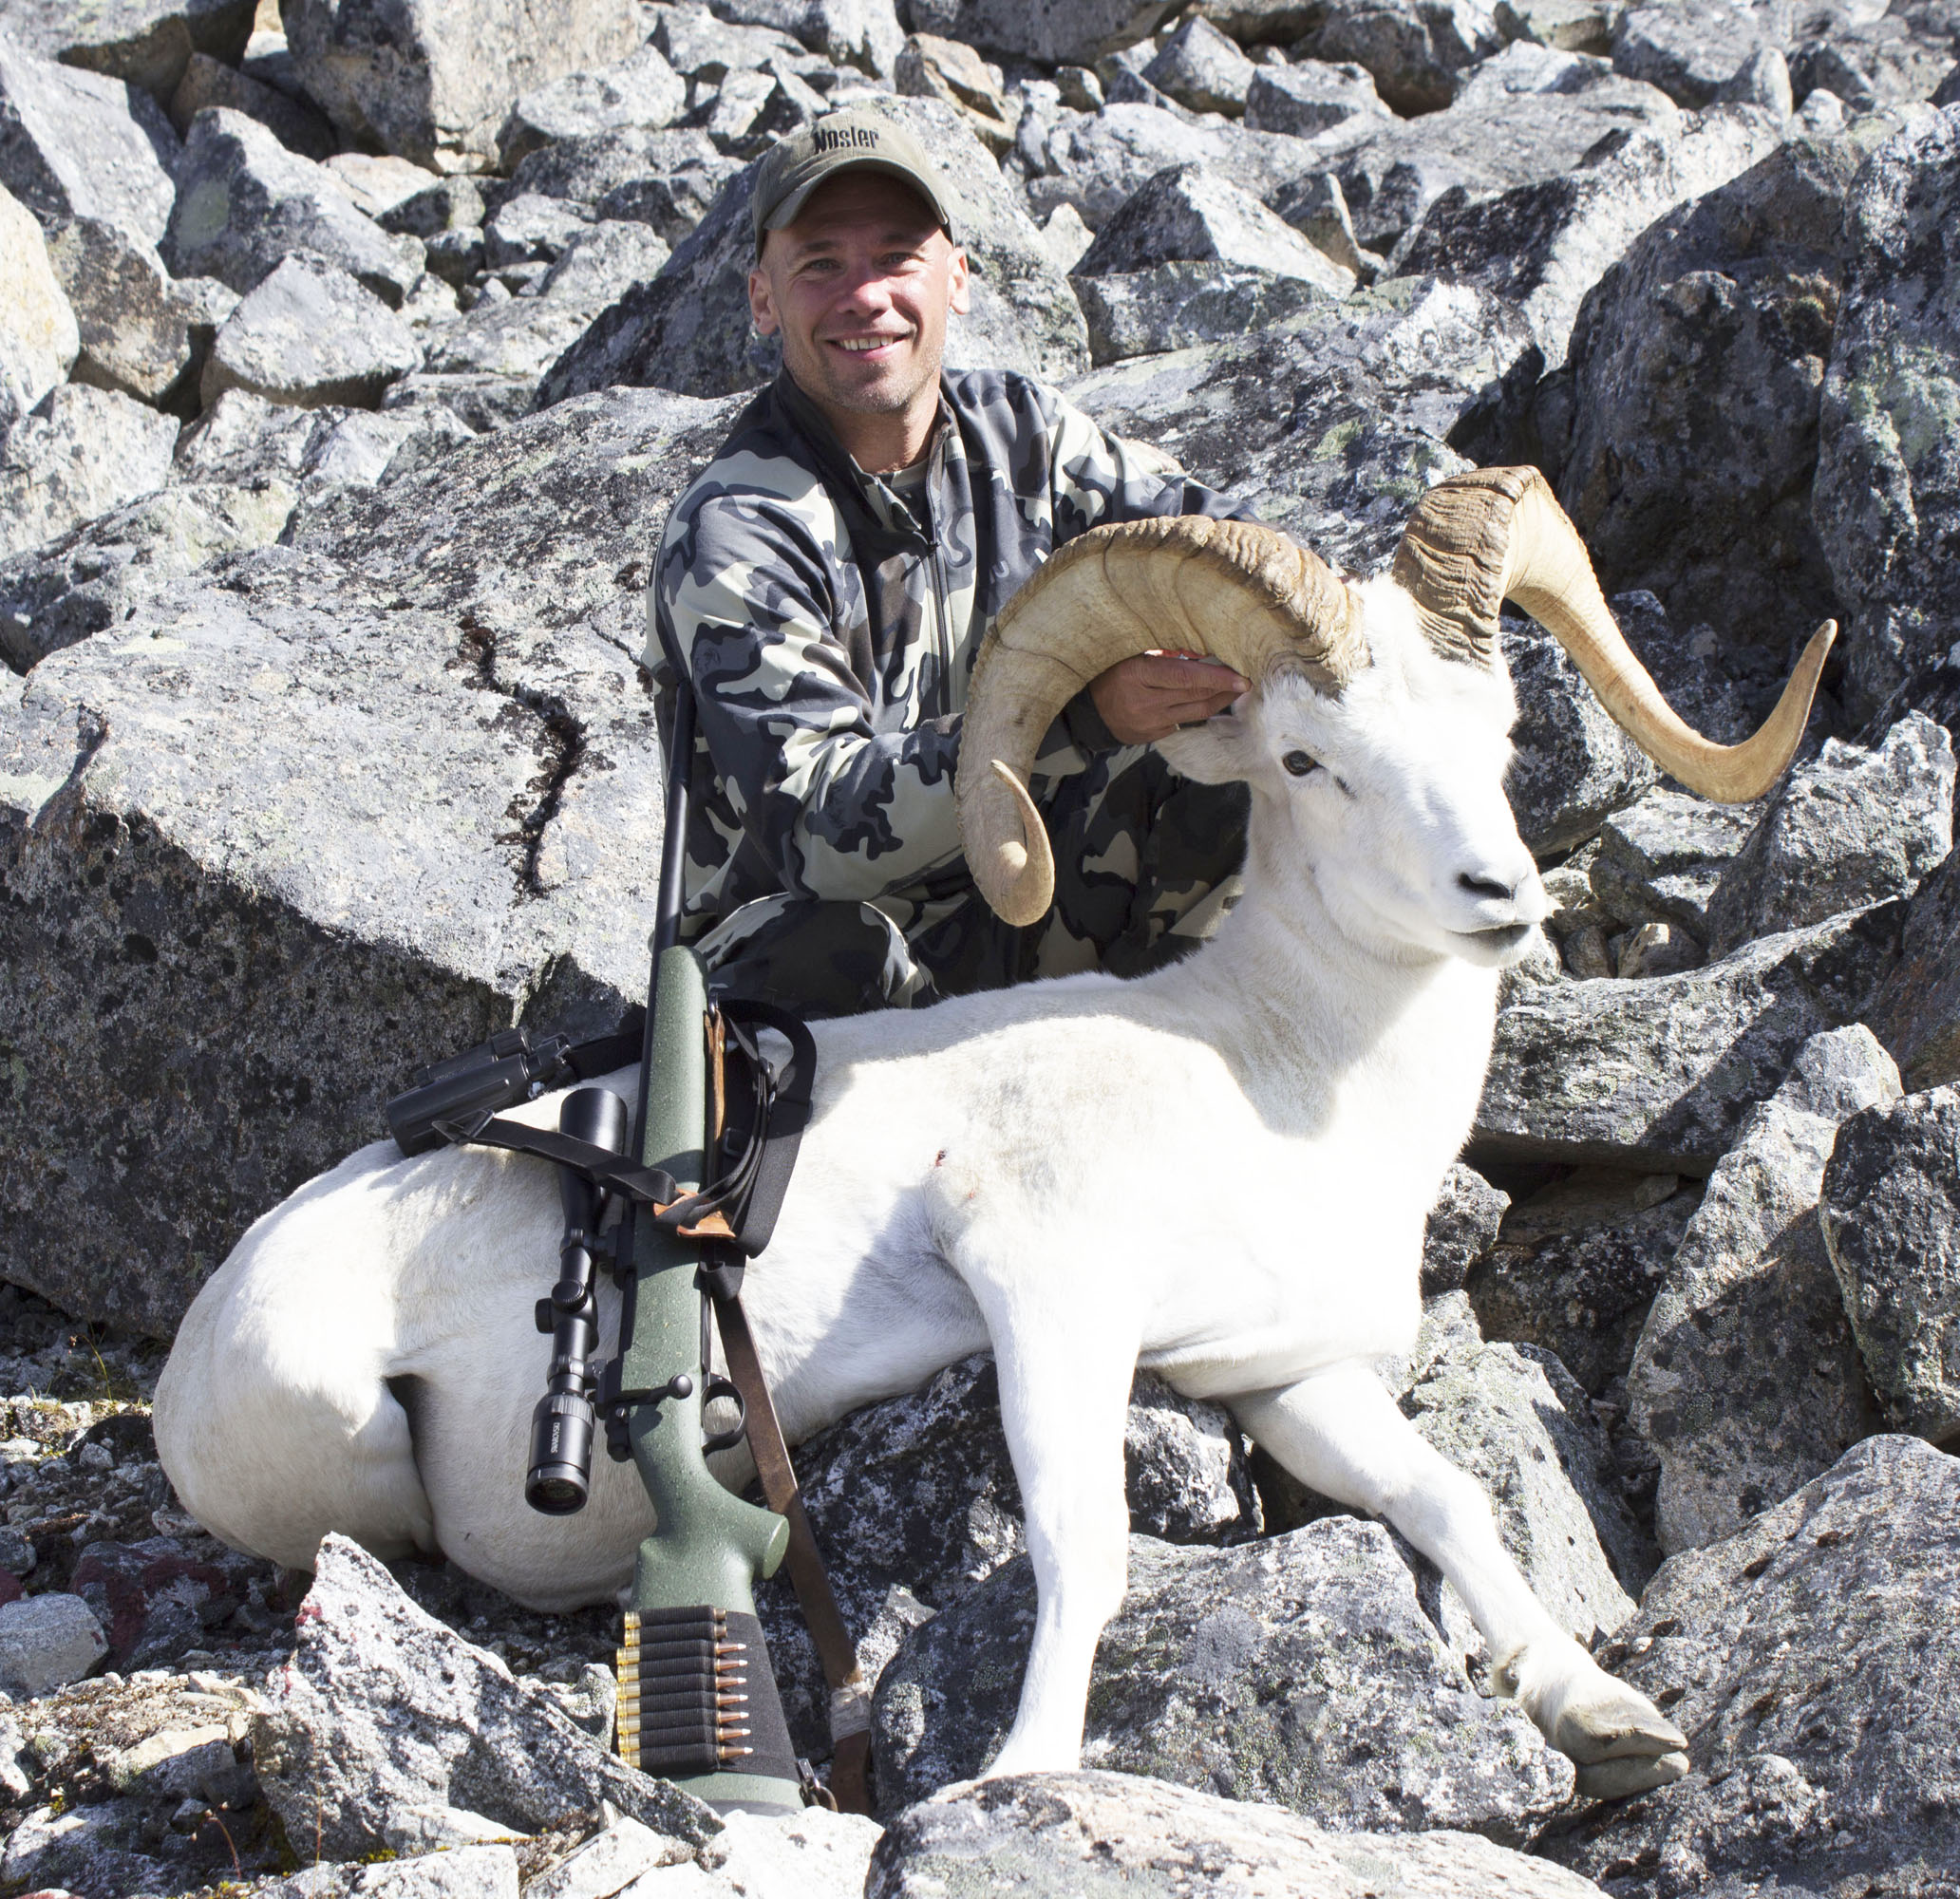 Sheep-JarredR-2016.jpg